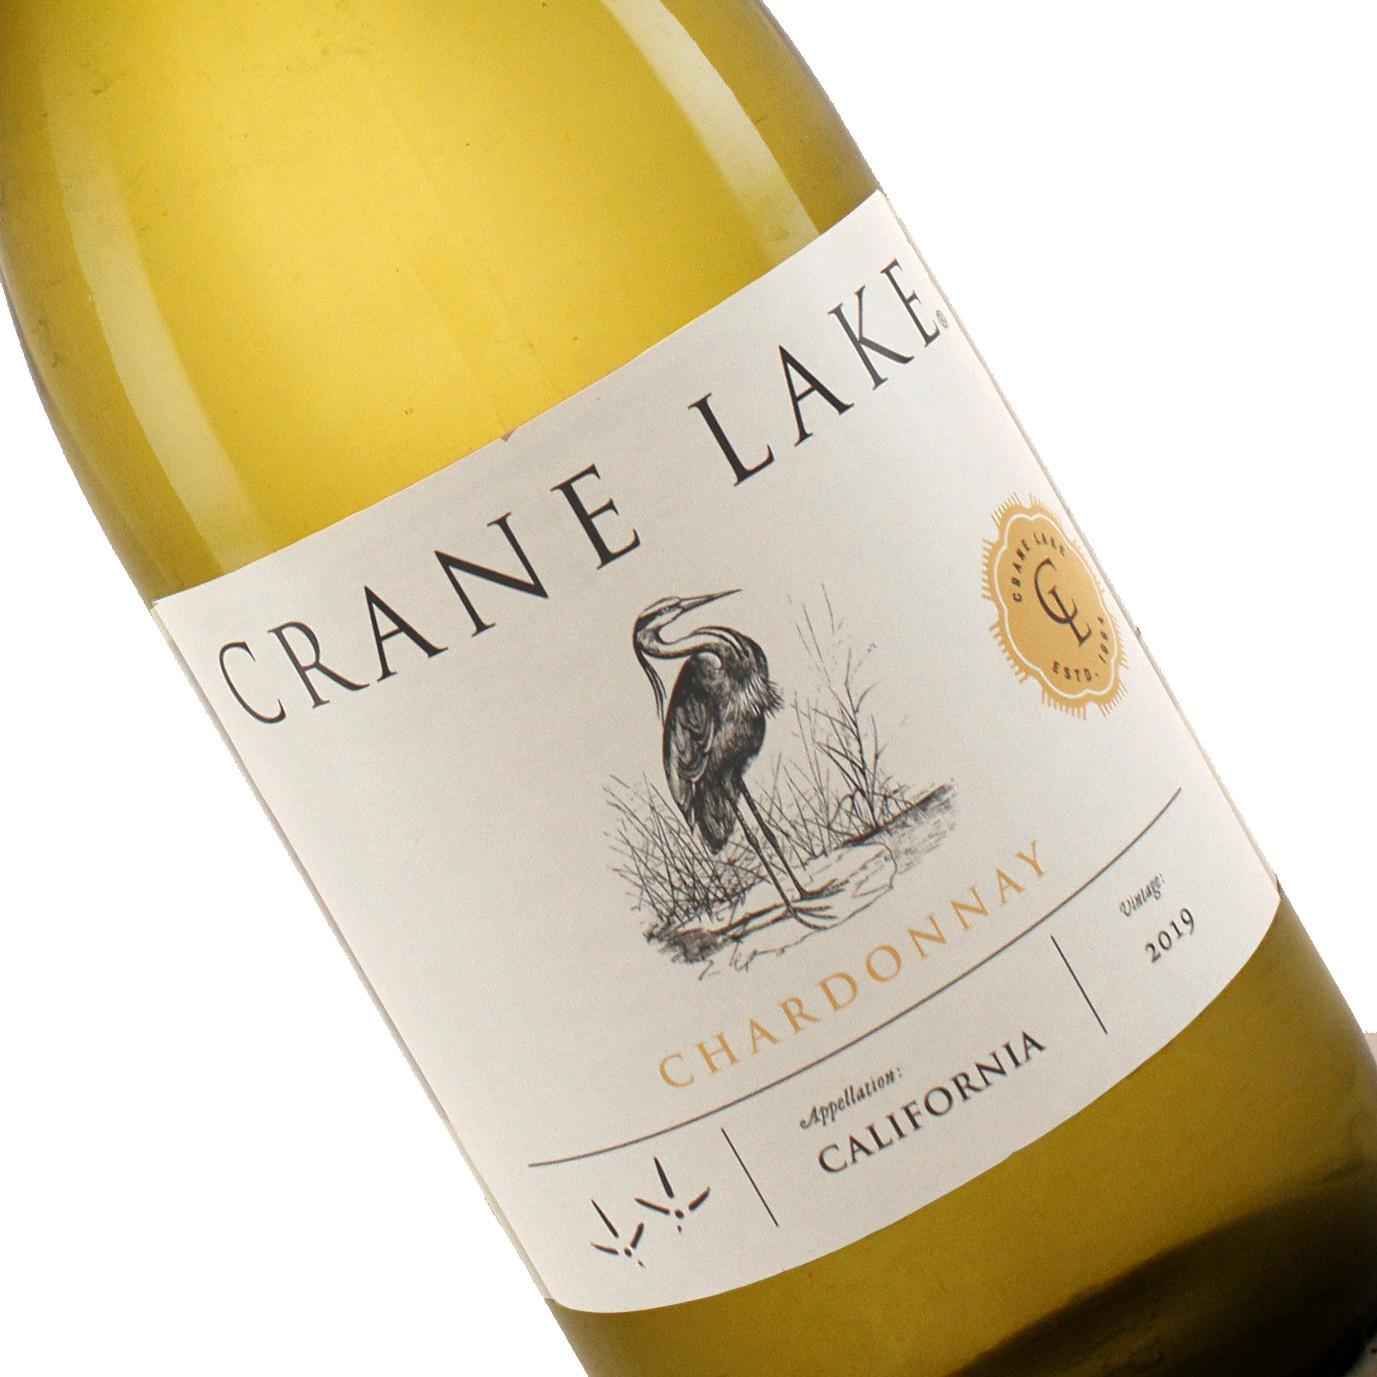 Crane Lake 2019 Chardonnay, California